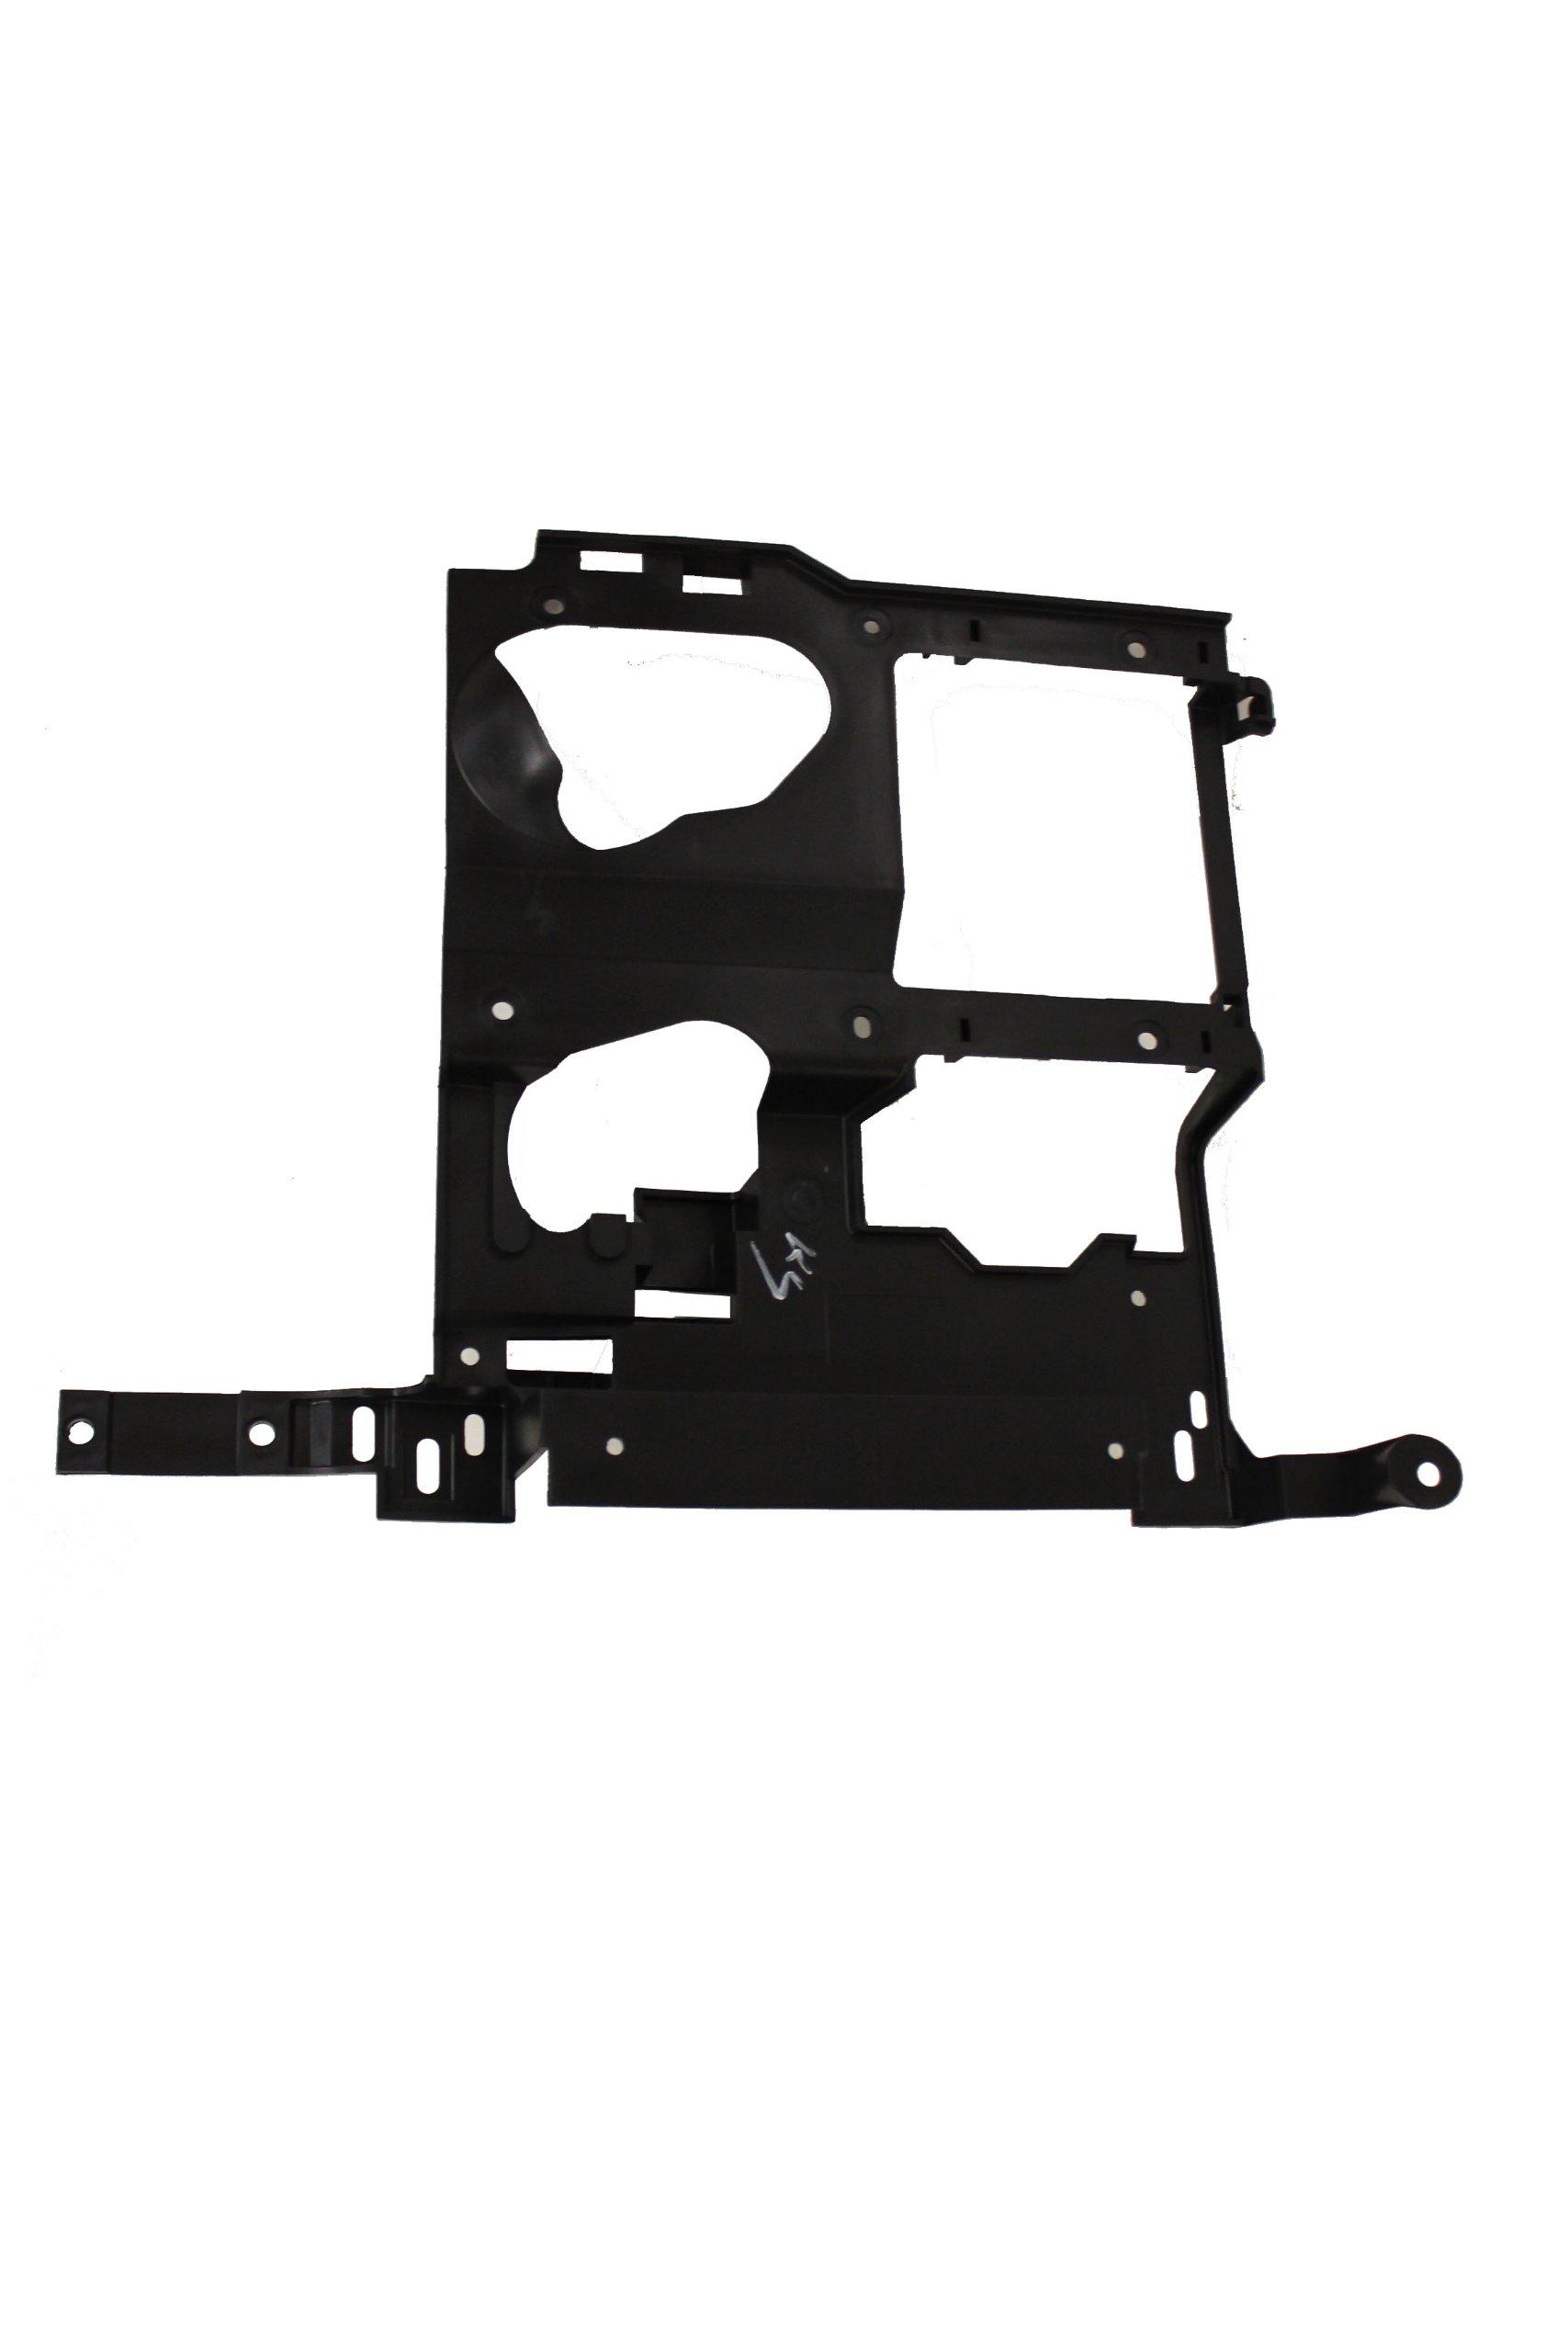 Genuine GM Parts 15798919 Headlamp Support